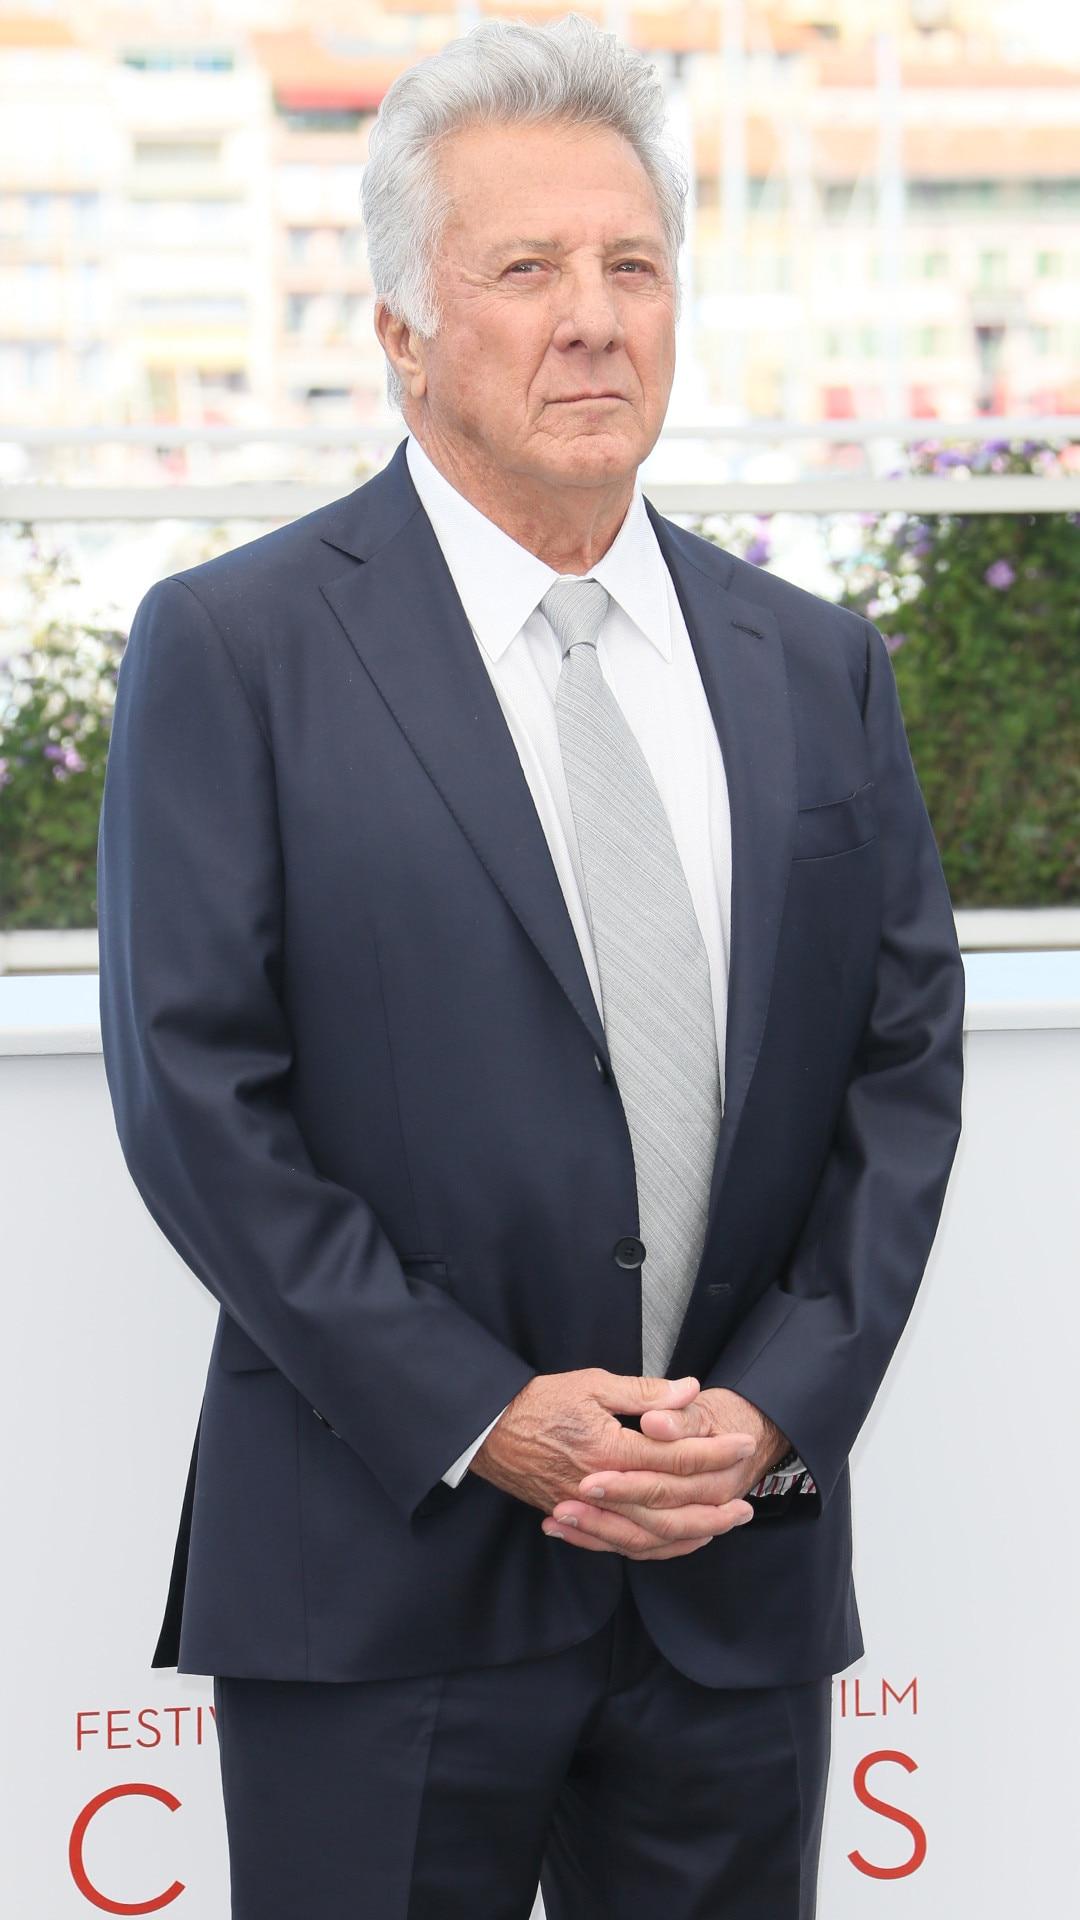 Dustin Hofmann